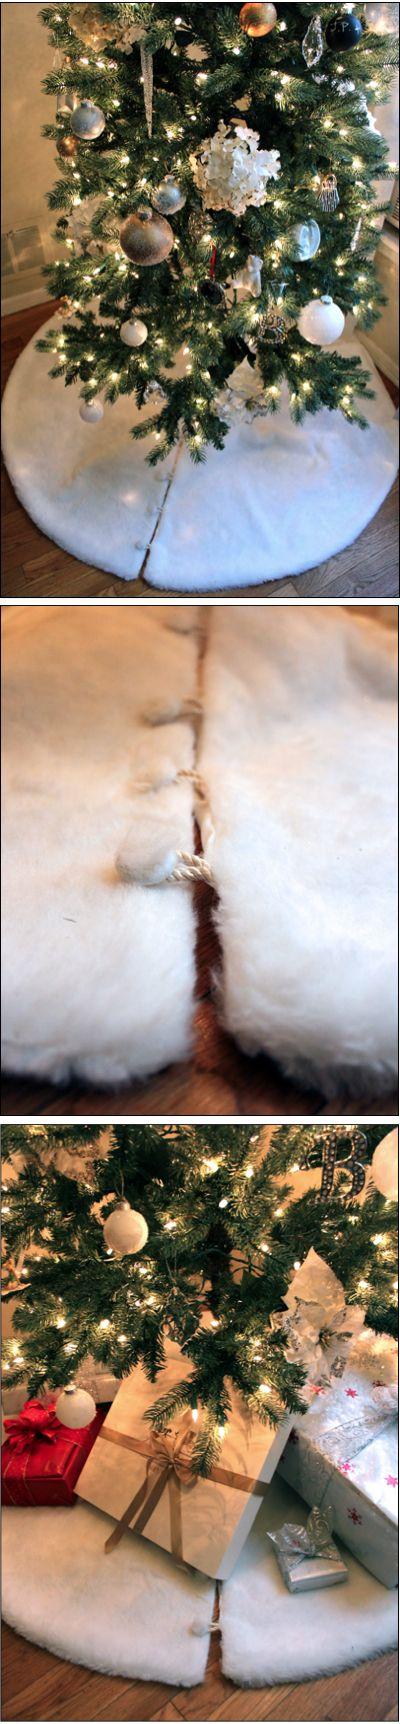 DIY faux fur tree skirt